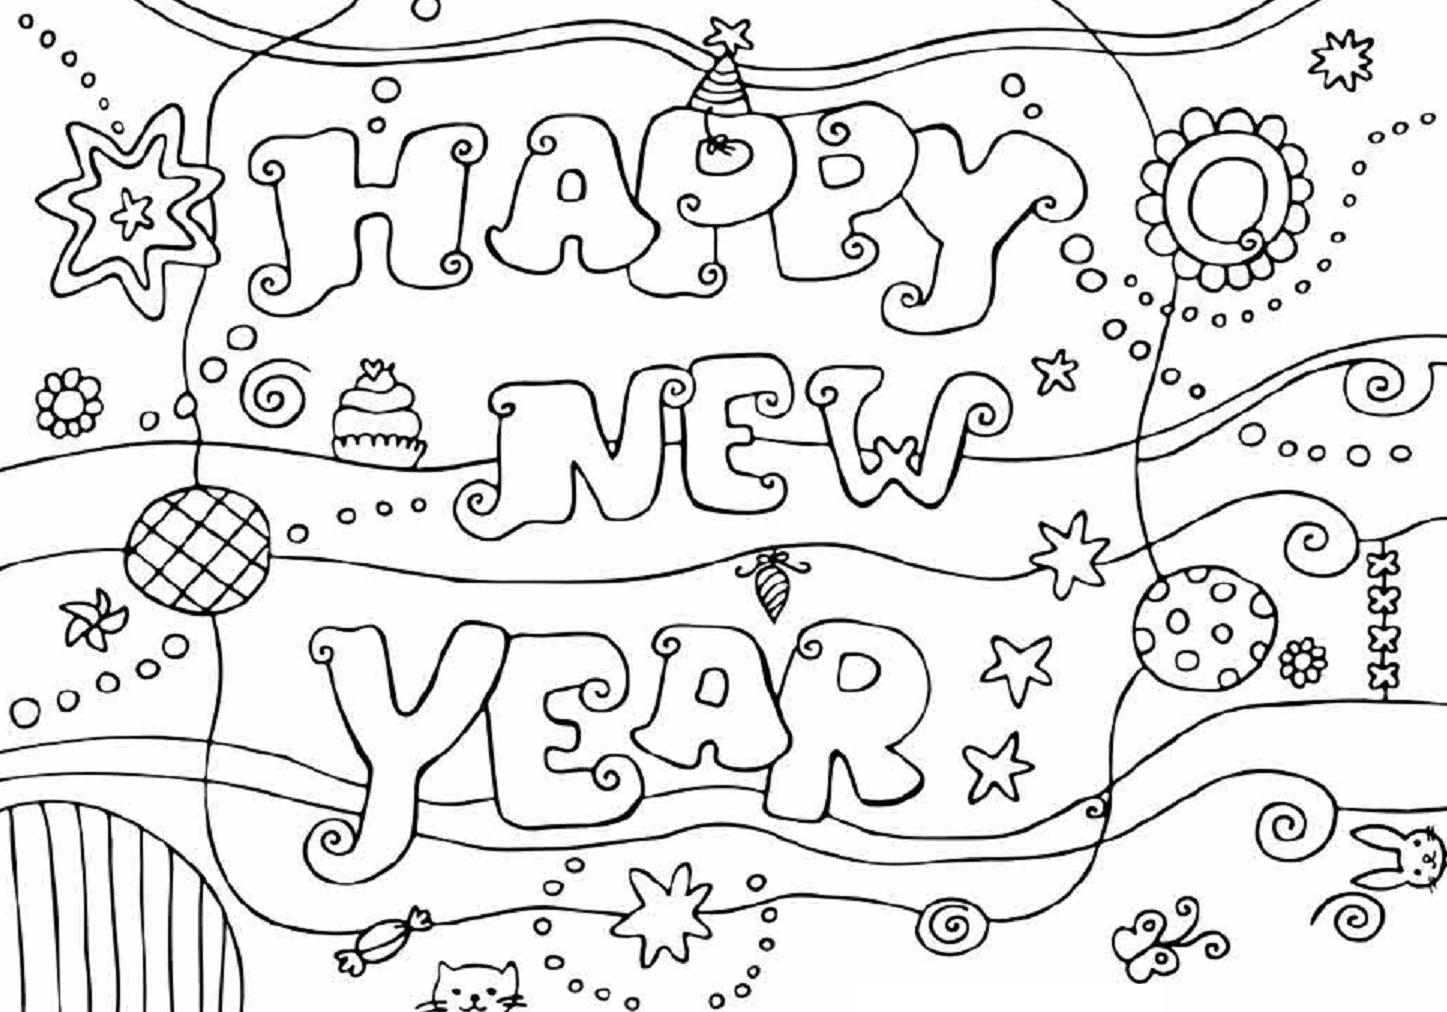 2015 wallpapers happy 2015